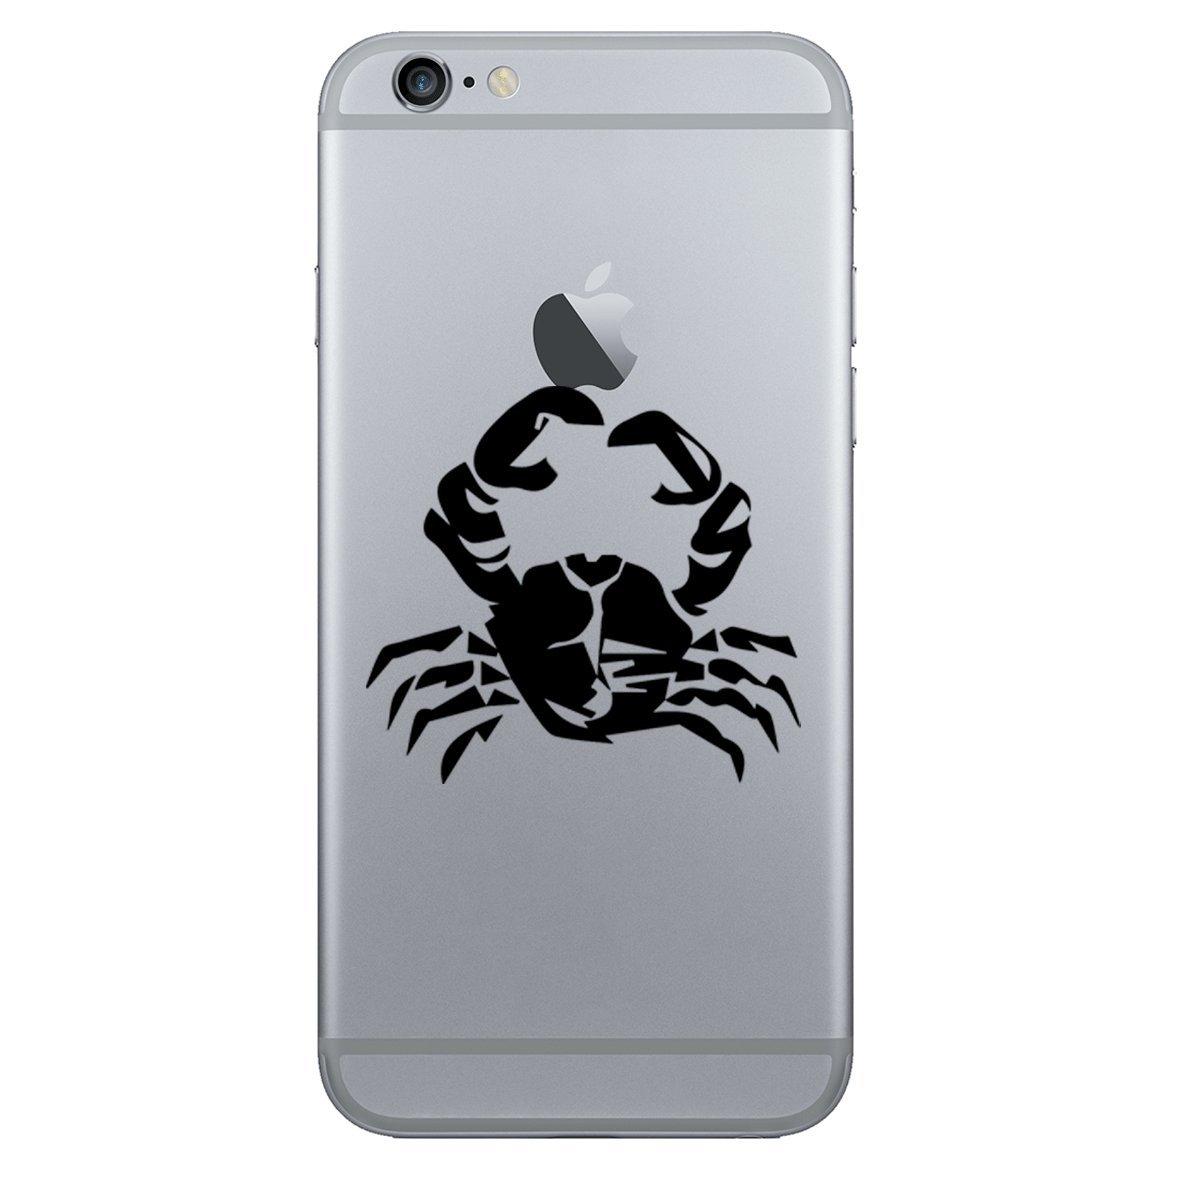 Amazon com: (2x) StickAny Phone Series Crab Grabbing Sticker for